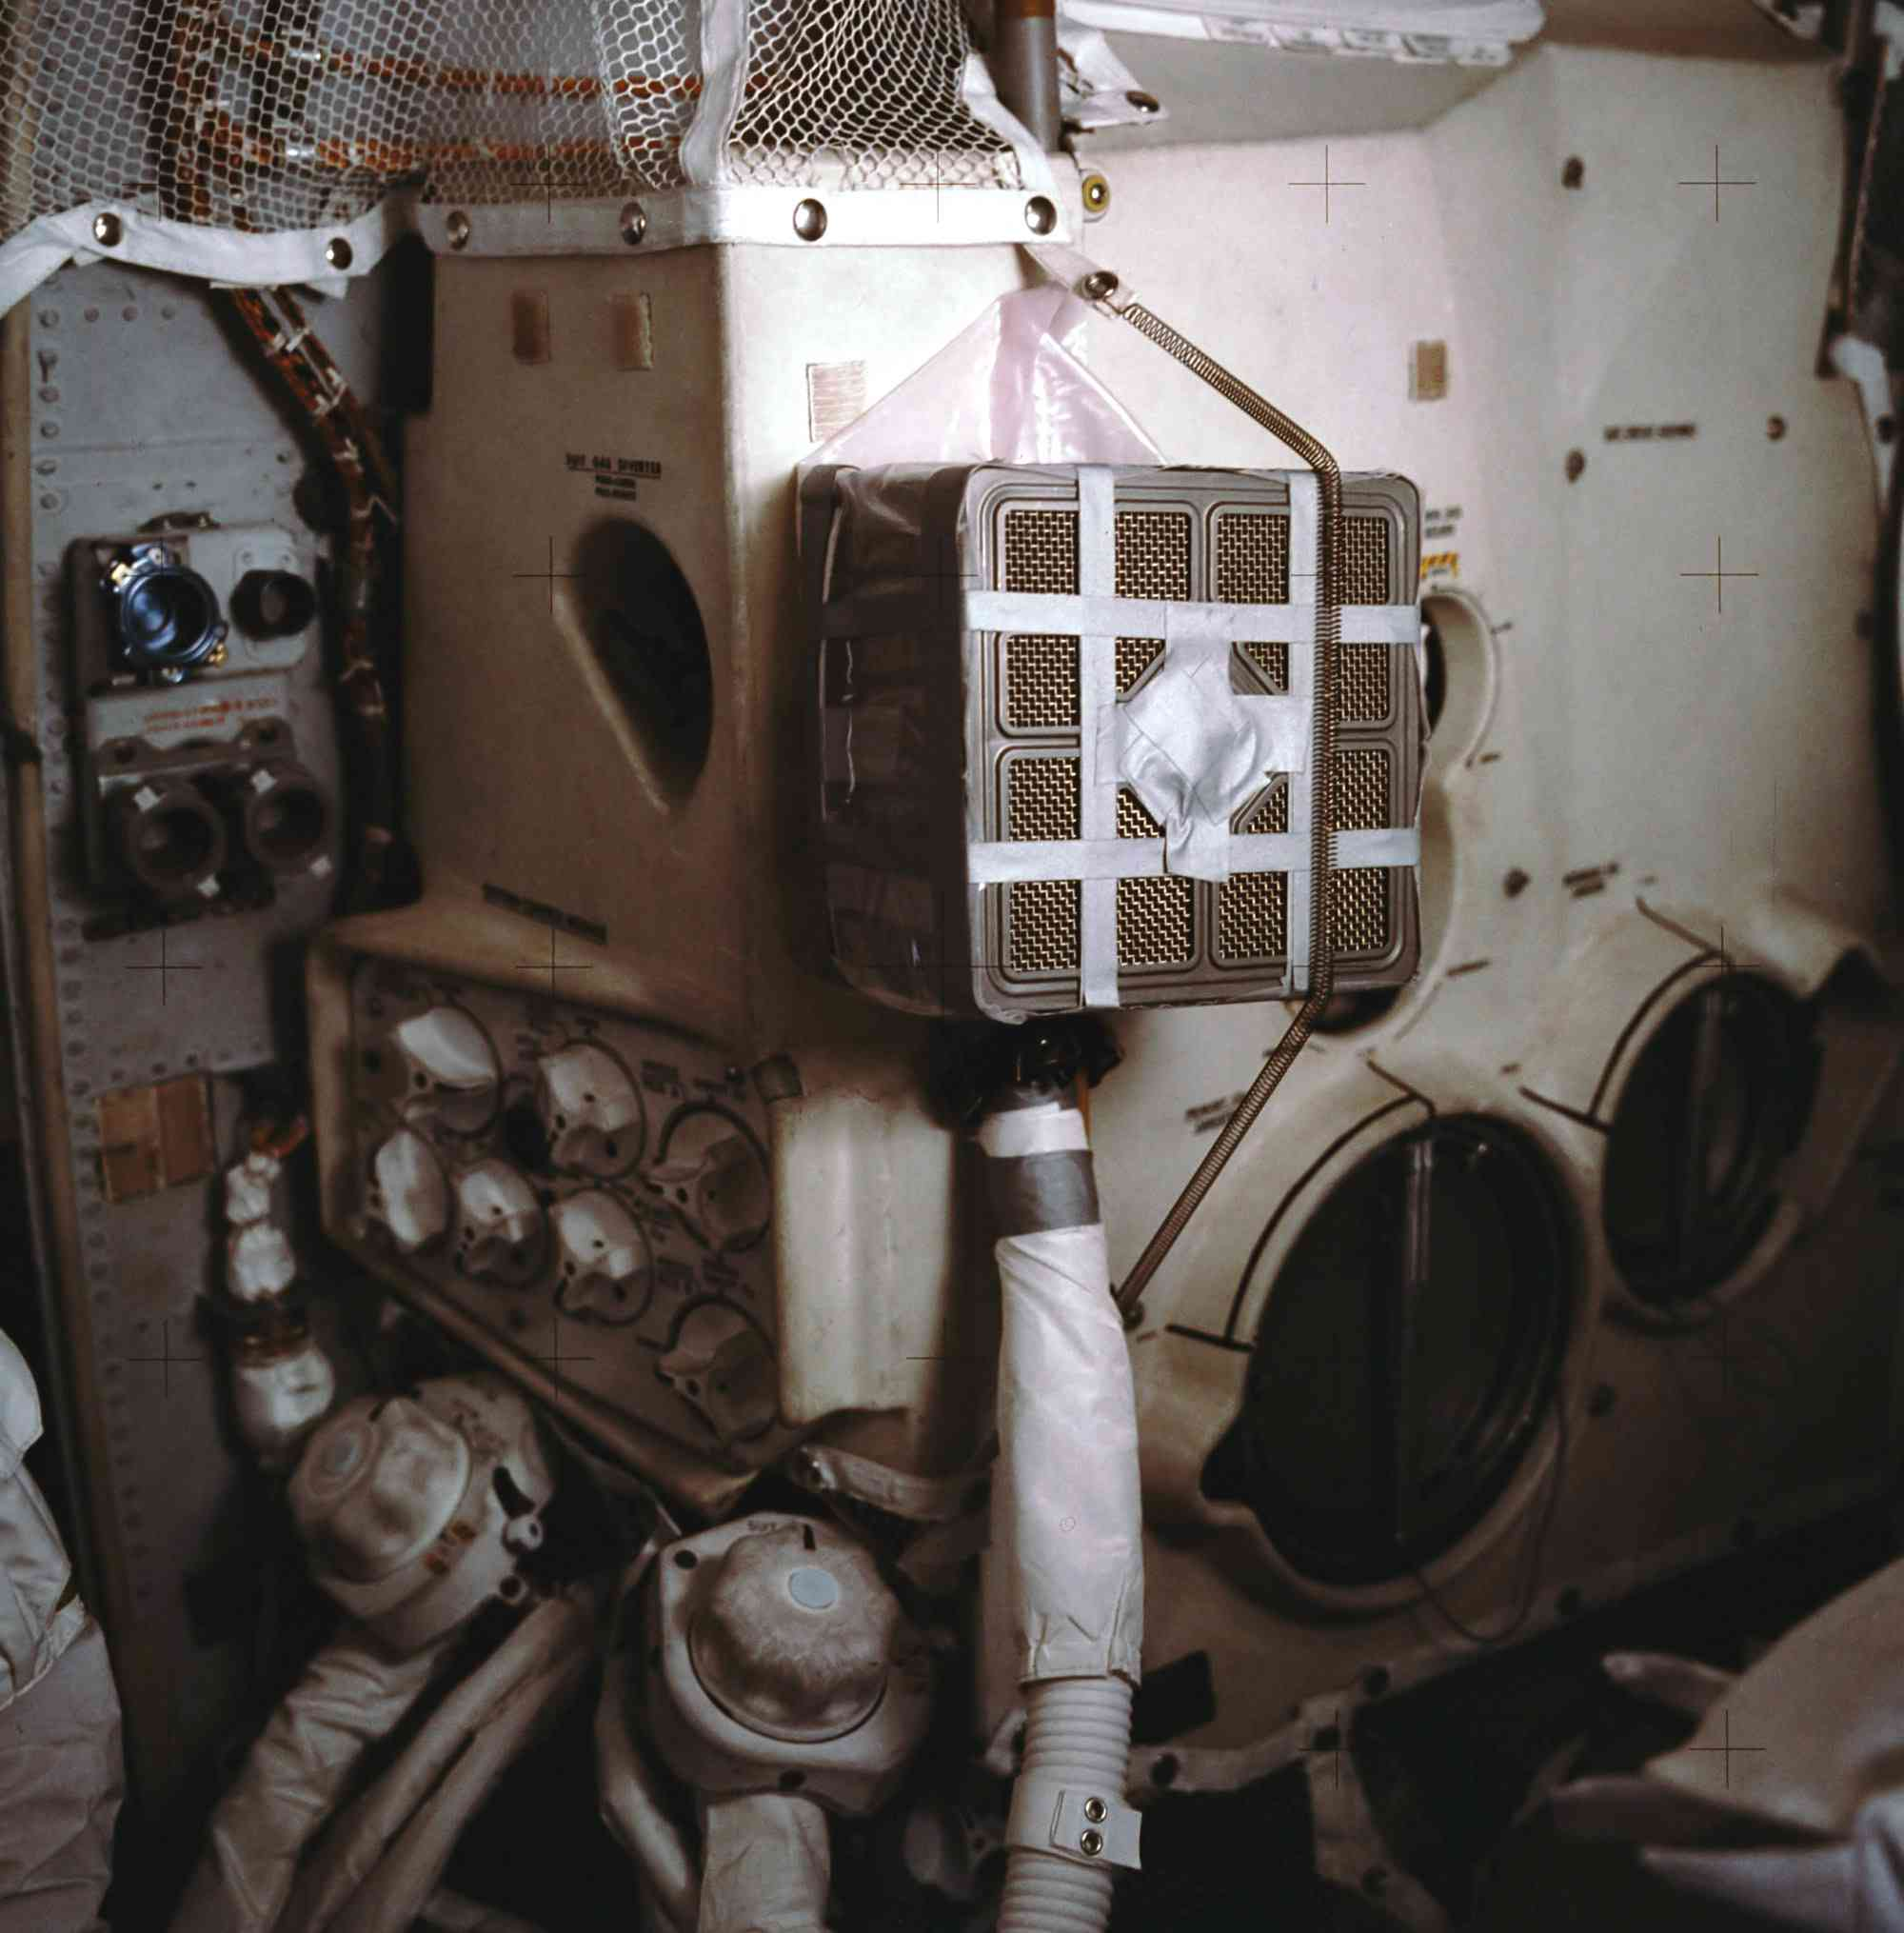 Apollo 13 oxygen device